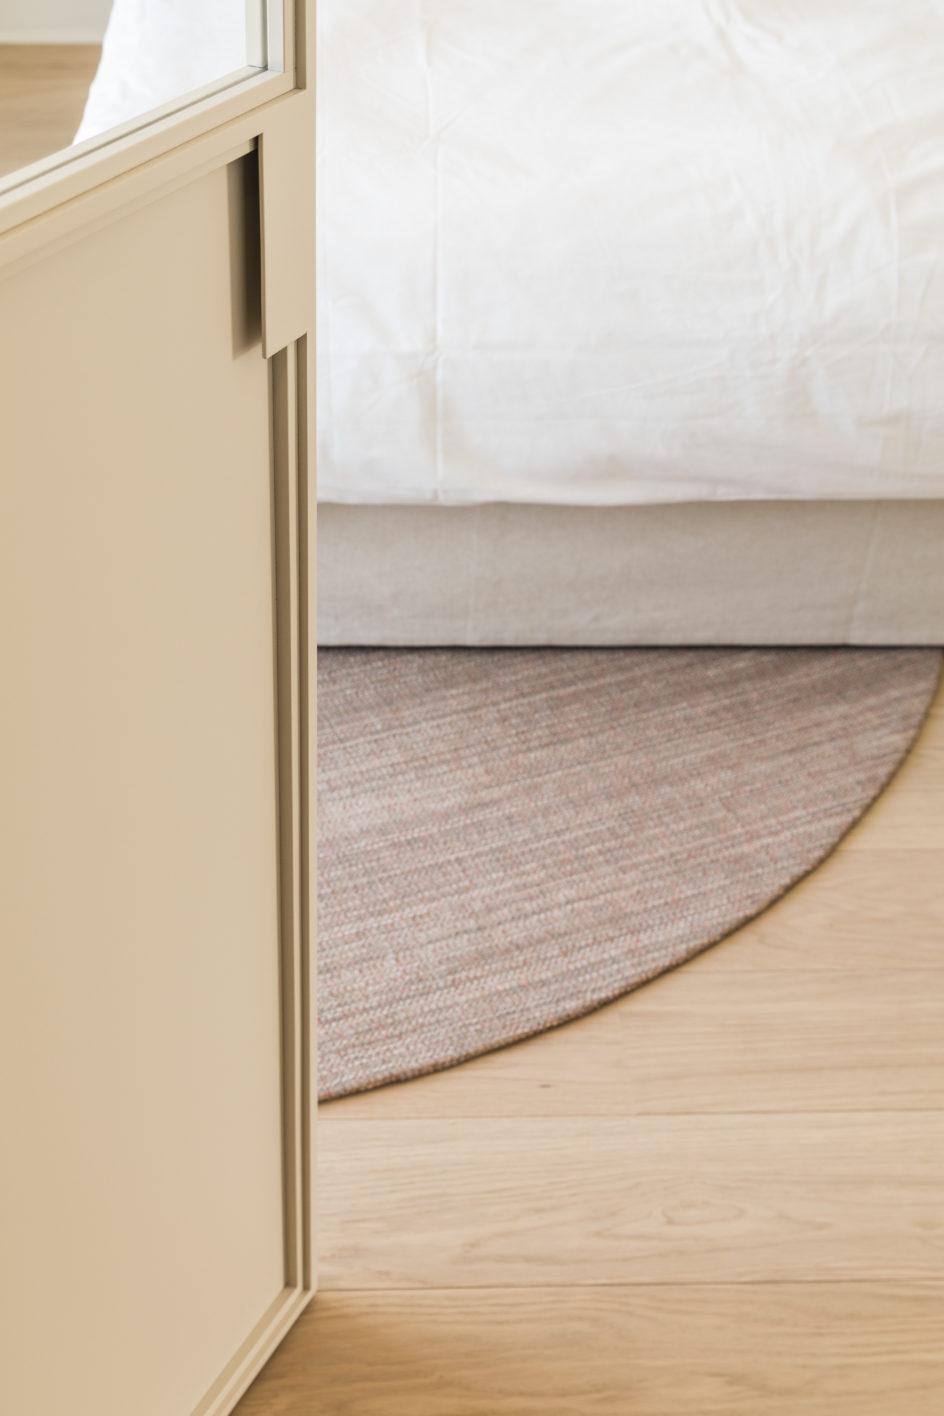 wit gelakte stalen binnendeur ontwerp interieurarchitecte Marie Lecluyse